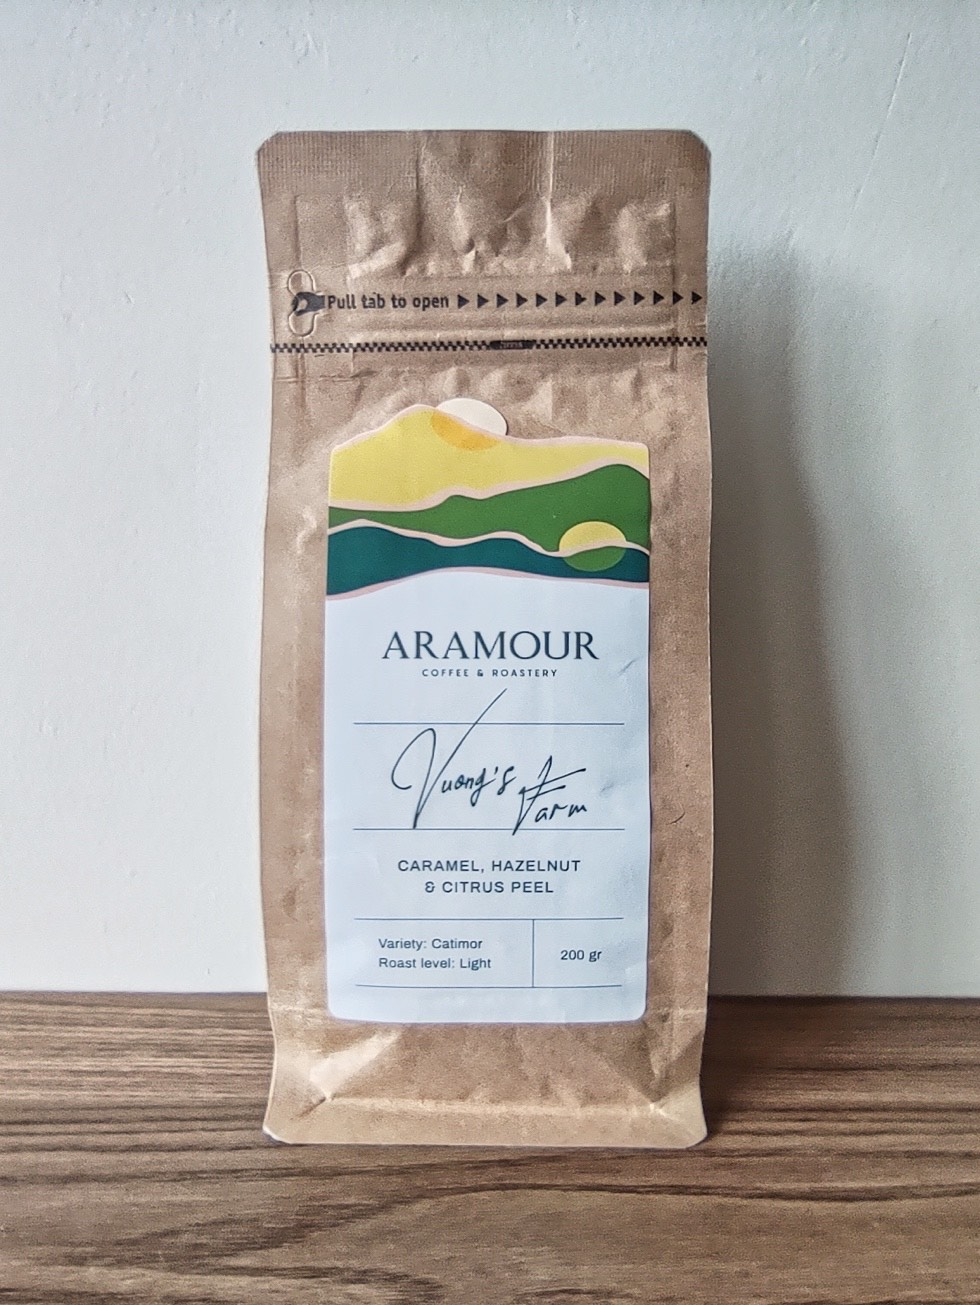 Aramour Coffee & Roastery Vuong's Farm